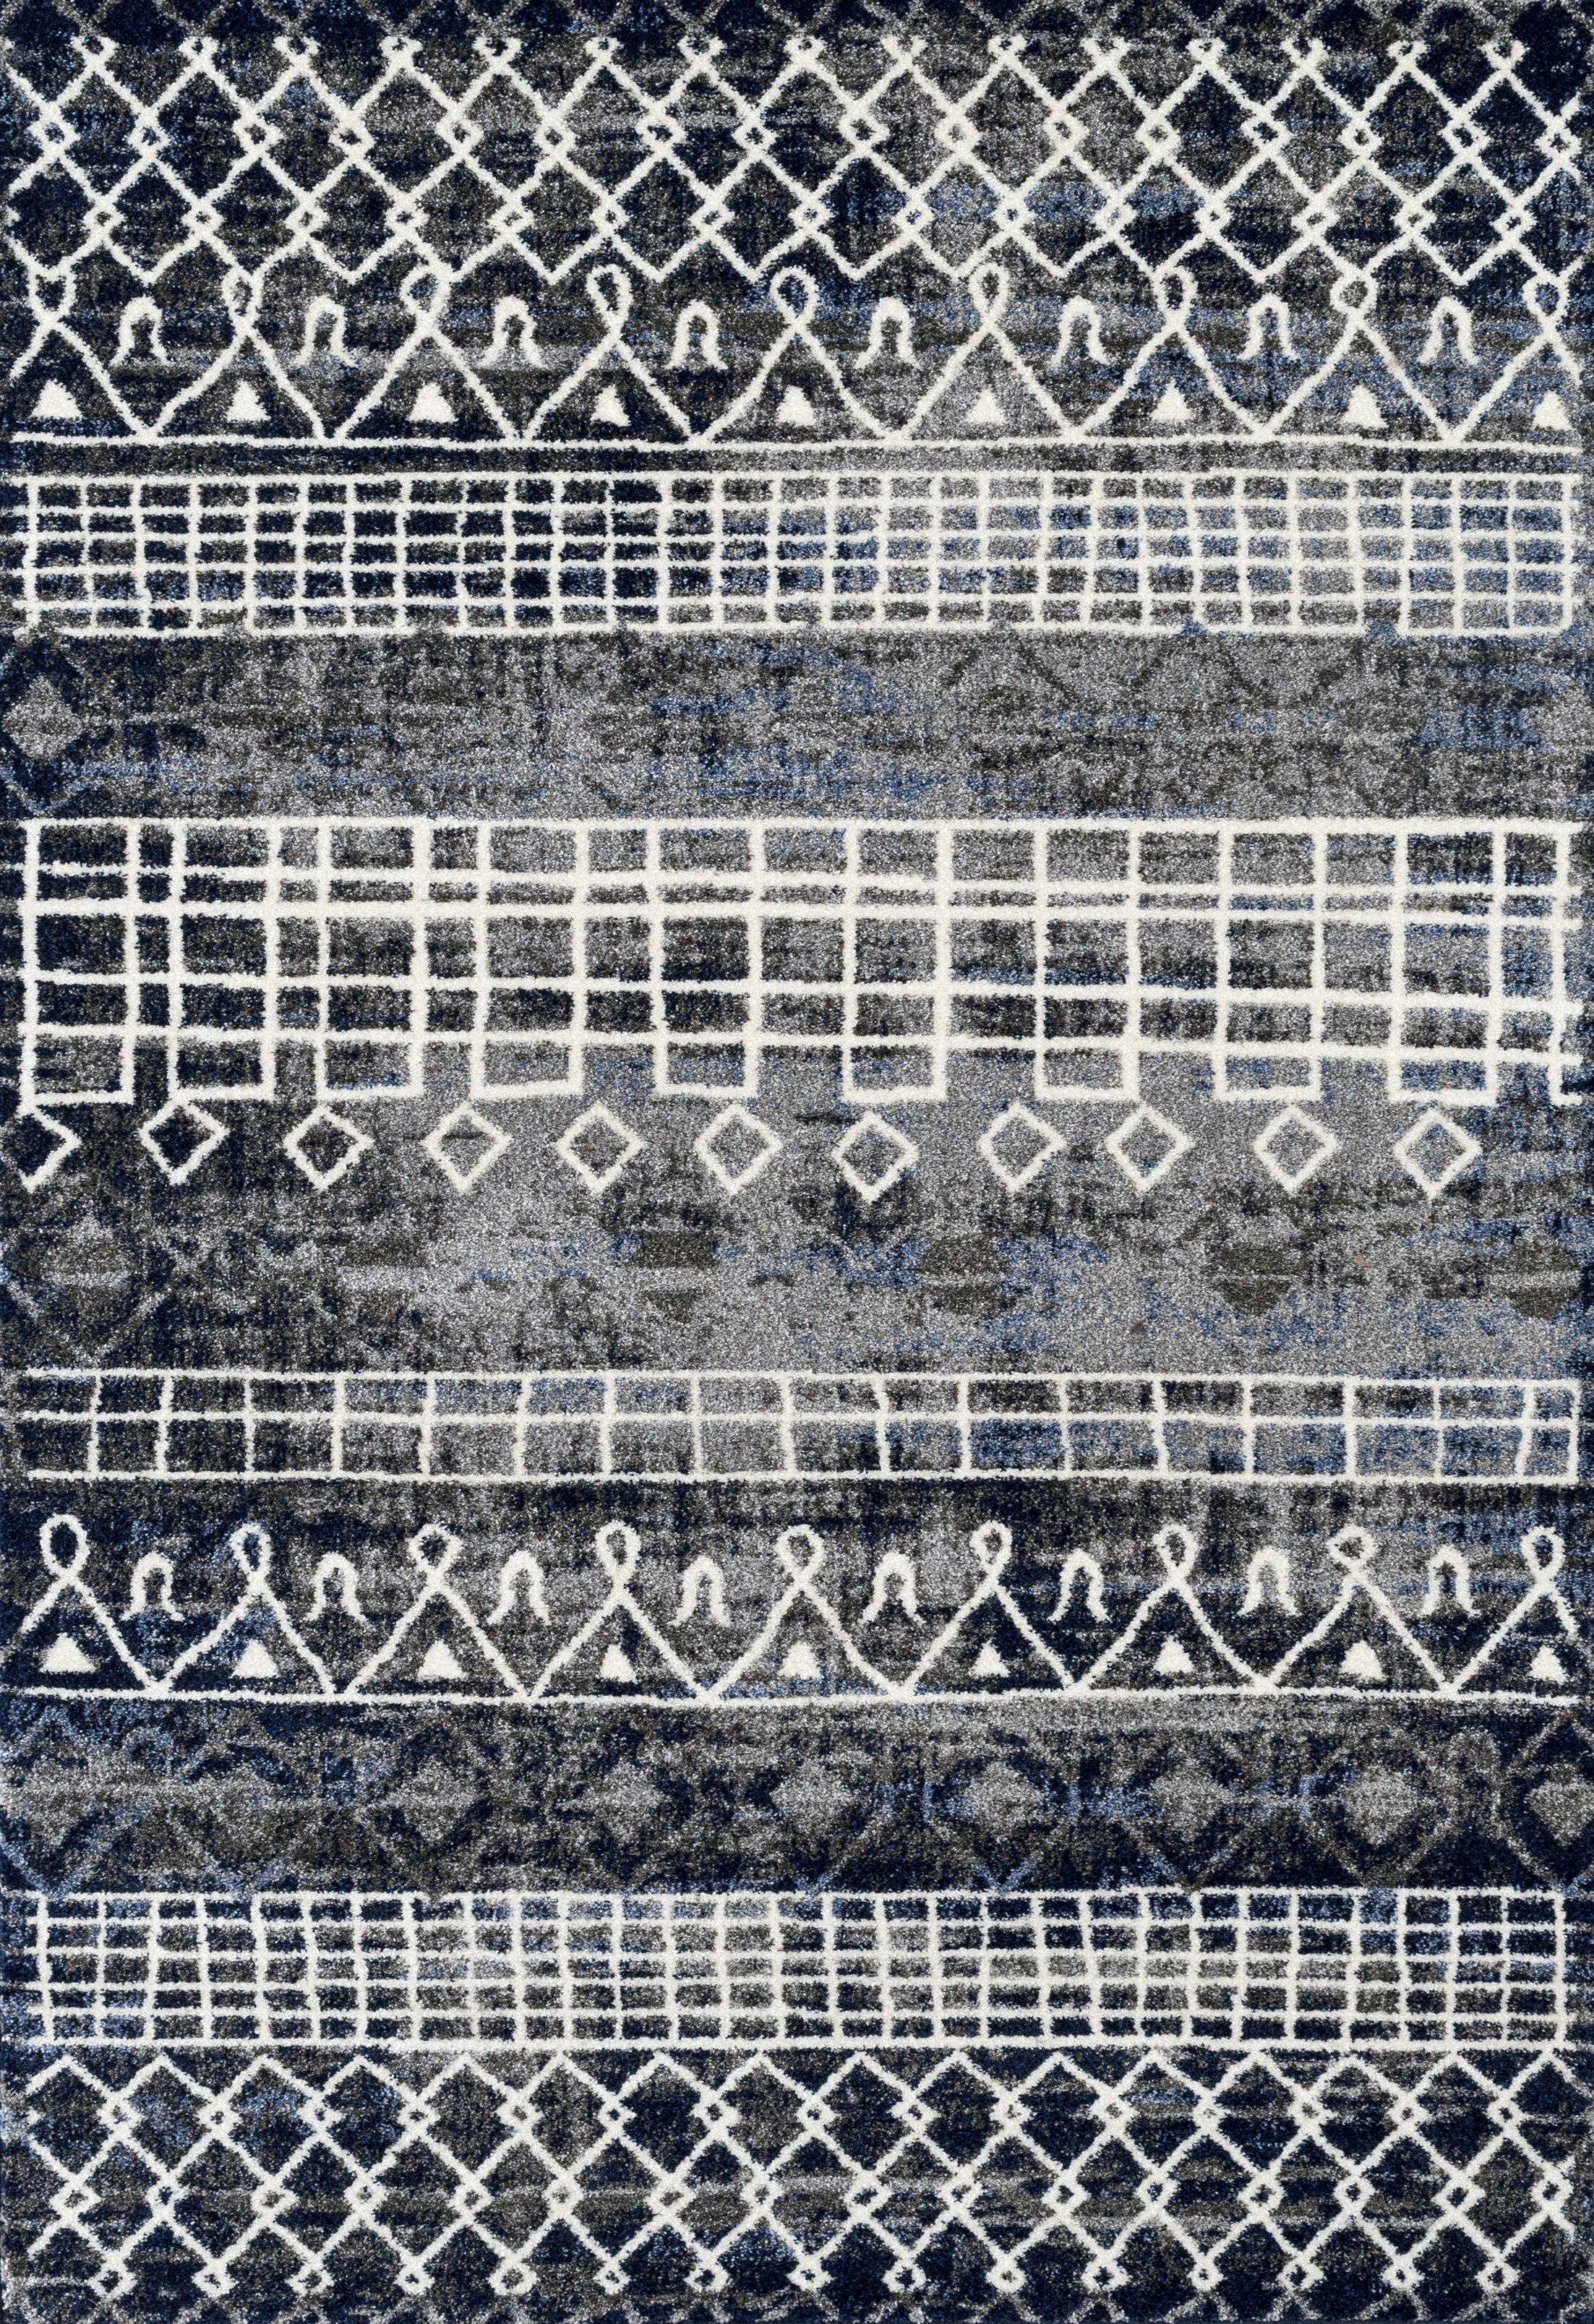 Mantz Modern Charcoal Area Rug Rug Size: Rectangle 7'10